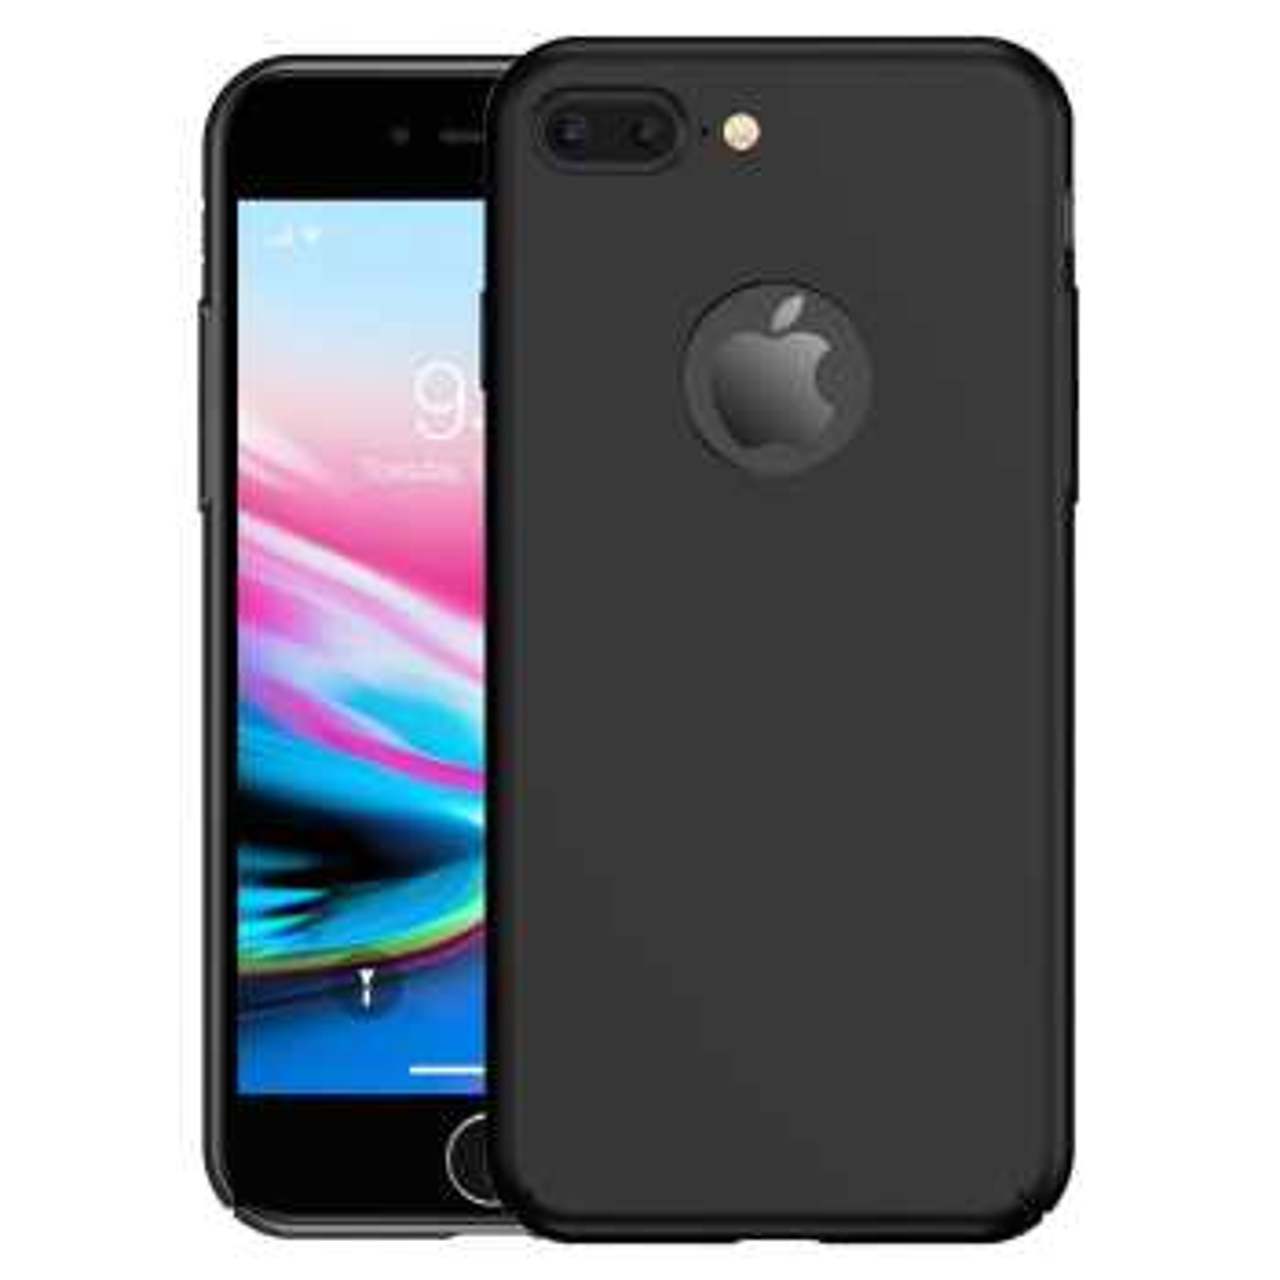 کاور  آیپکی مدل Hard Case مناسب برای گوشی Apple iPhone 7 Plus